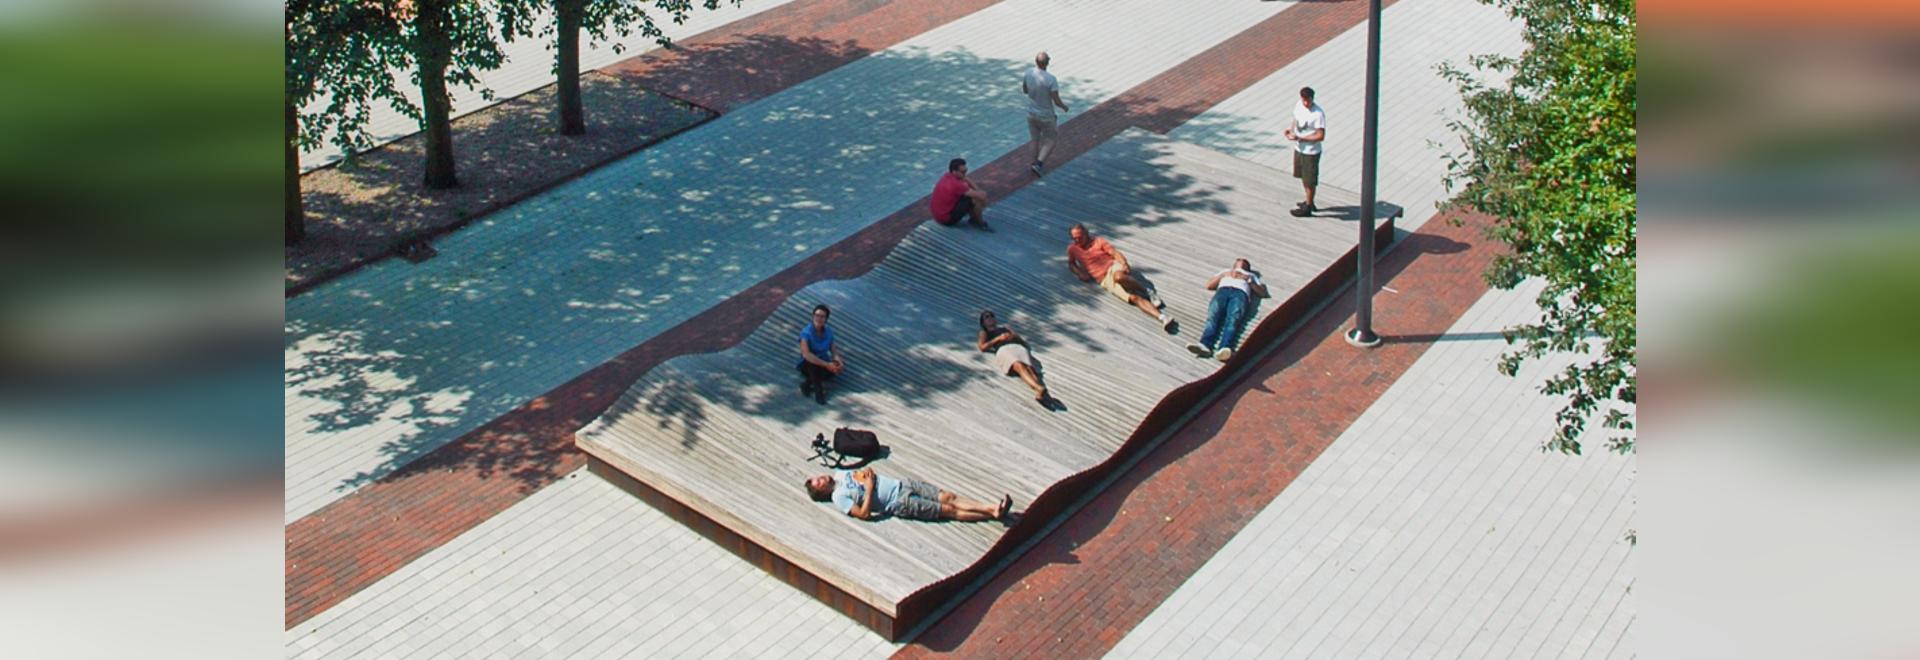 Architectural award for social square in Halmstad